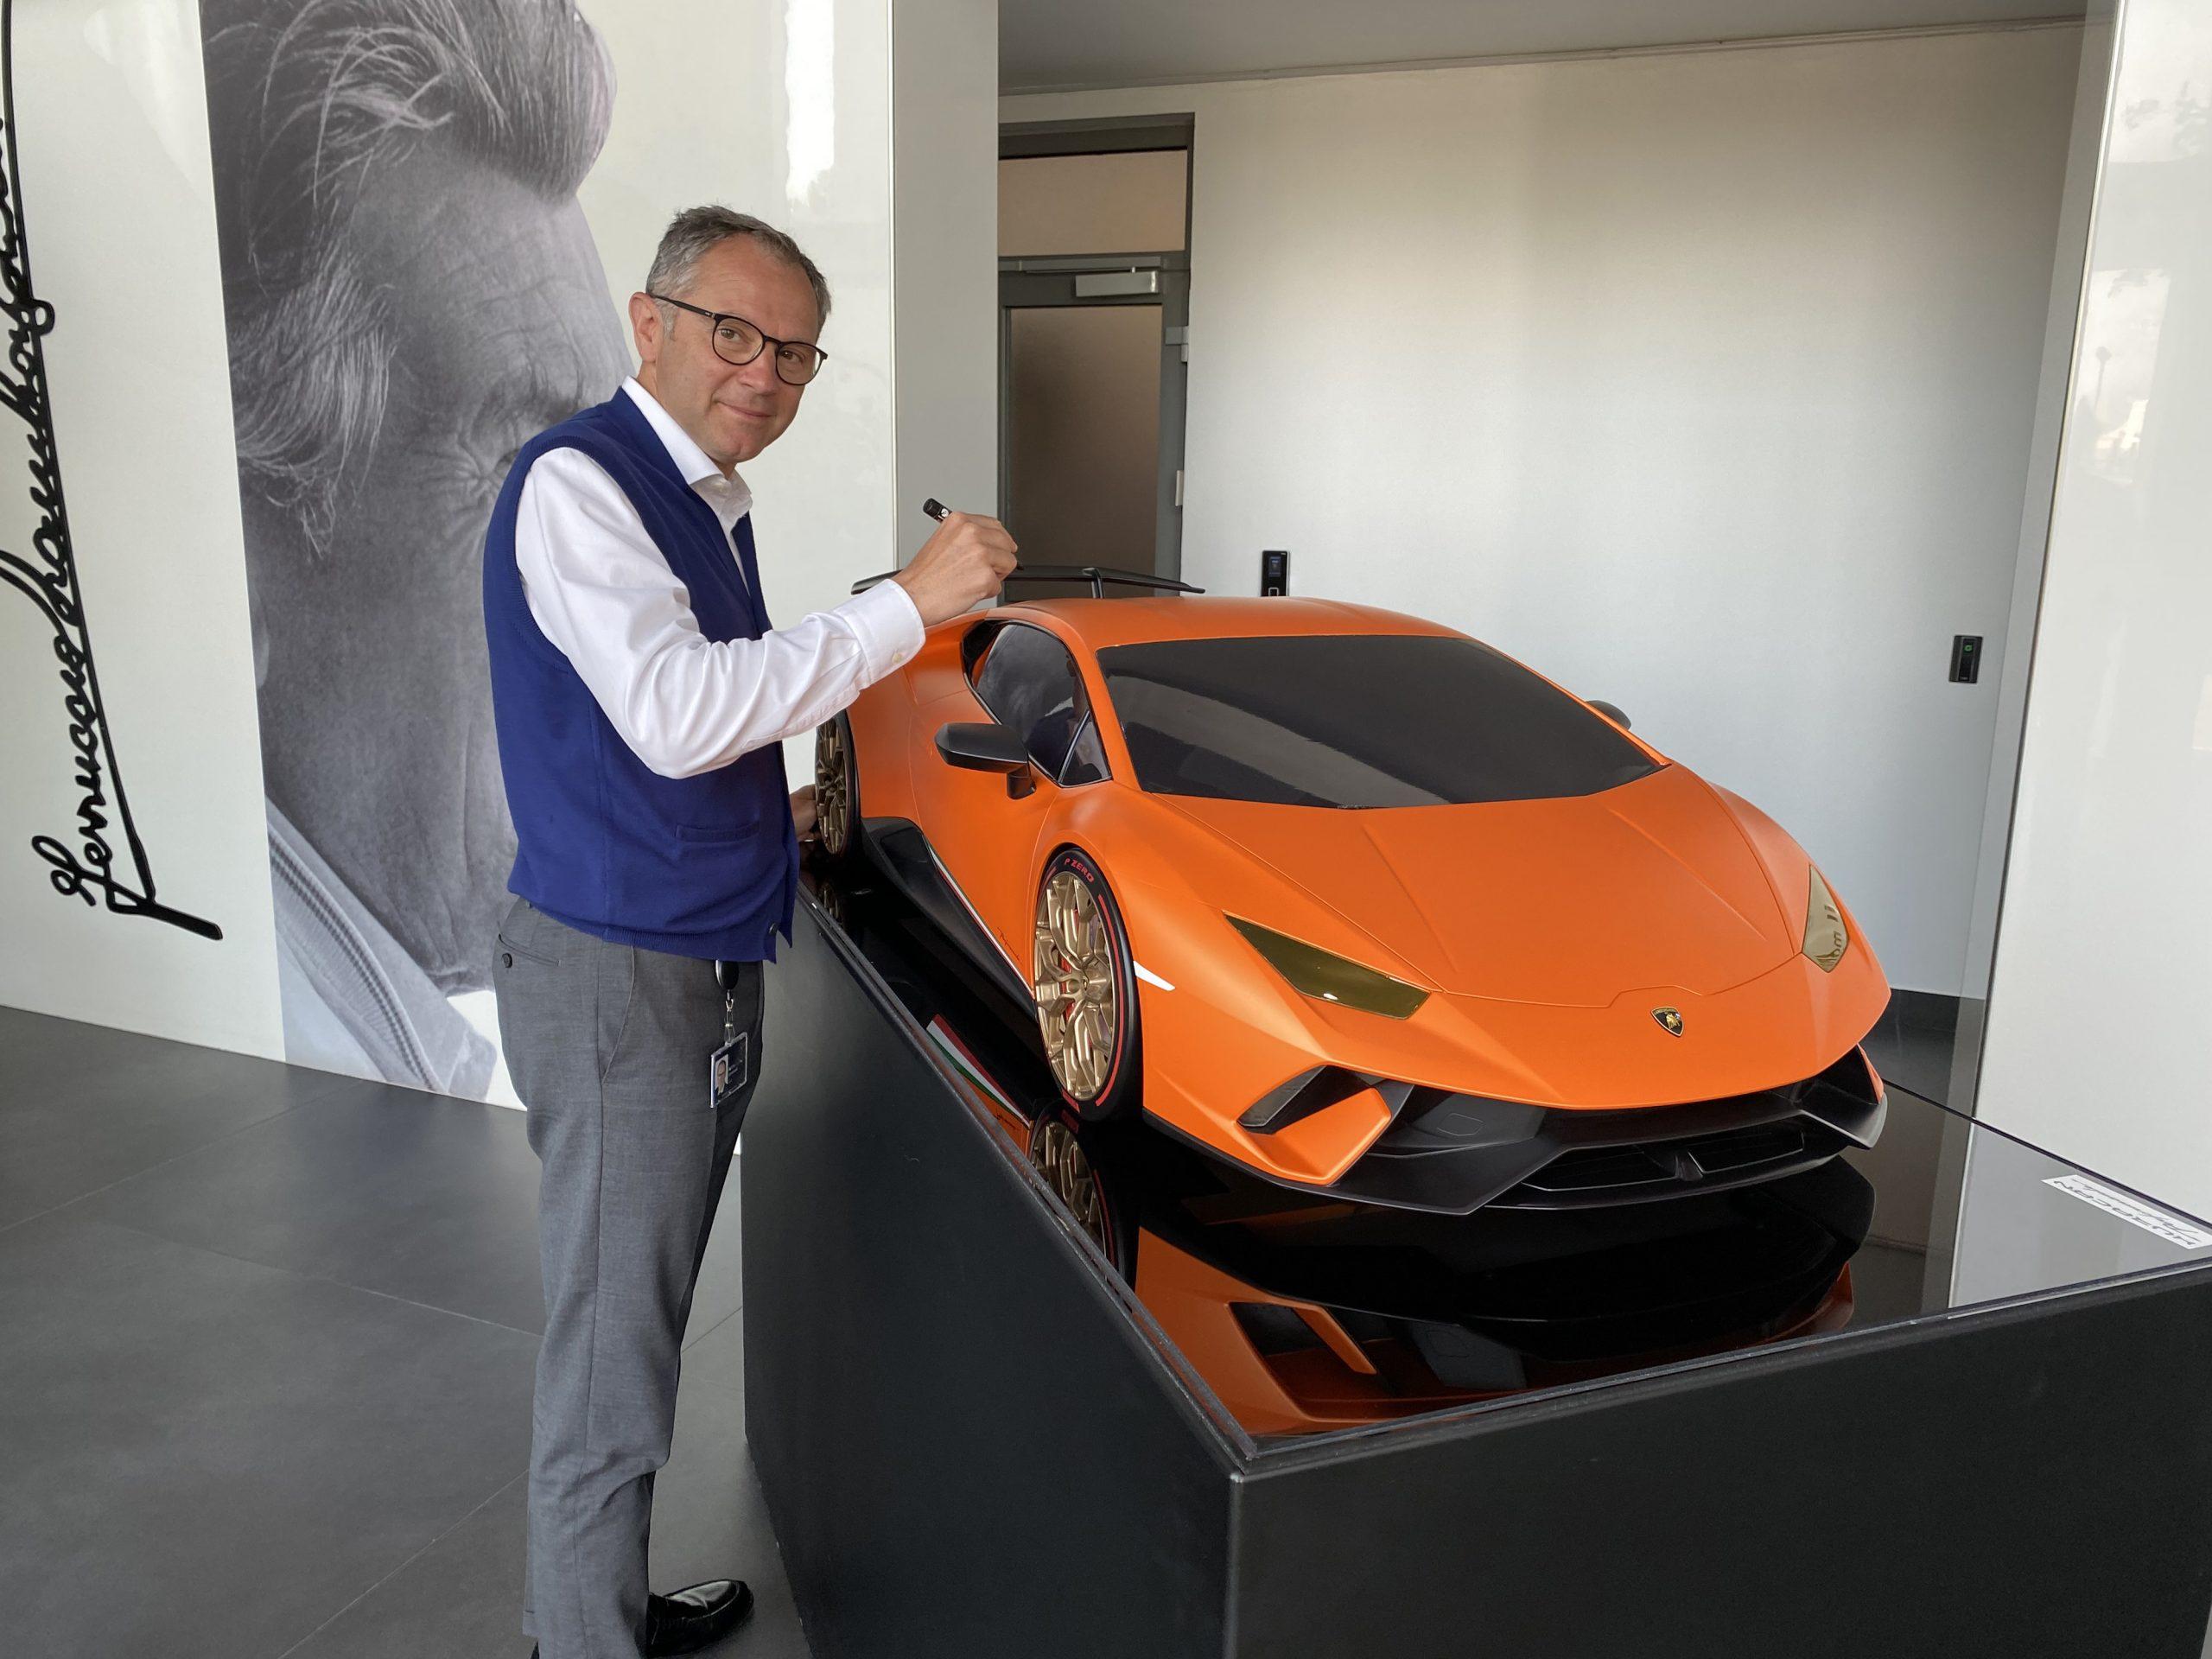 A sensational scale model Lamborghini Huracán Performante donated by Automobili Lamborghini Spa